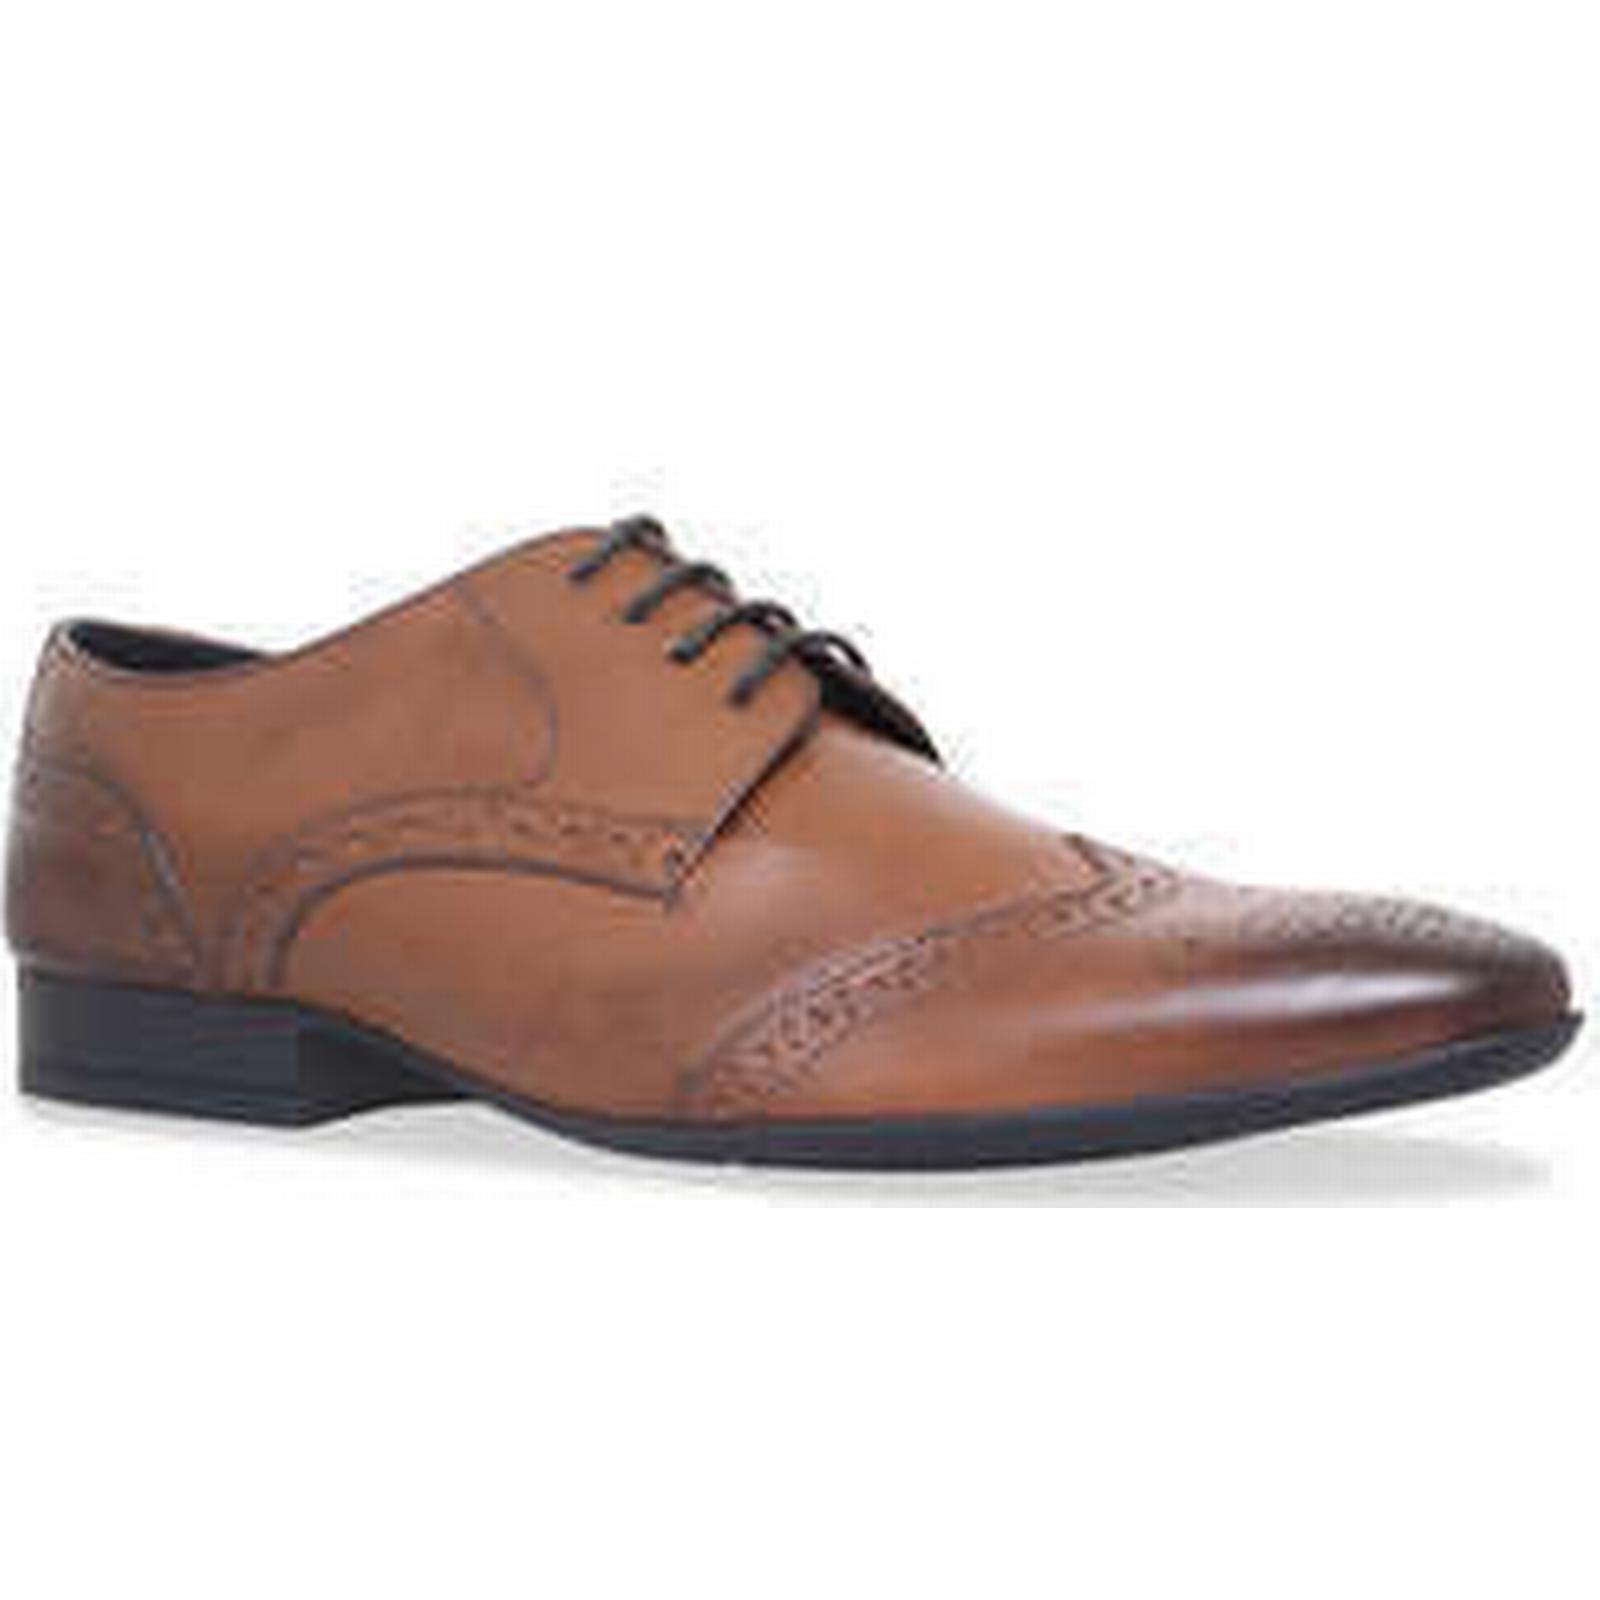 Gentleman/Lady:CATESBY GIBSON: Do not worry shopping when shopping worry 8890b5